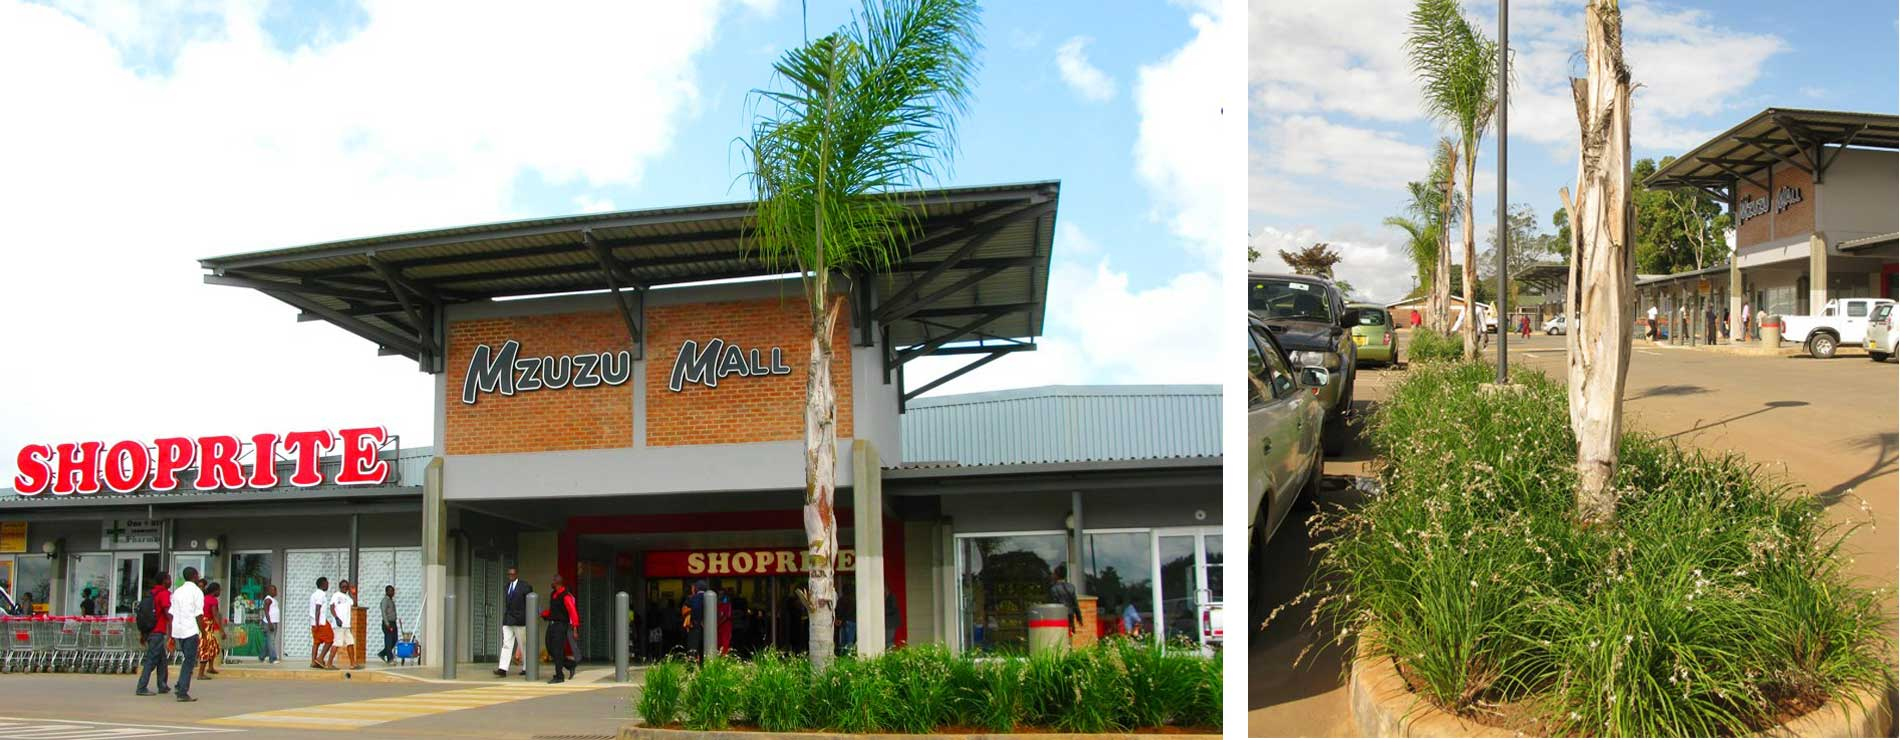 Gallery RETAIL SHOPPING CENTRE Mzuzu Malawi